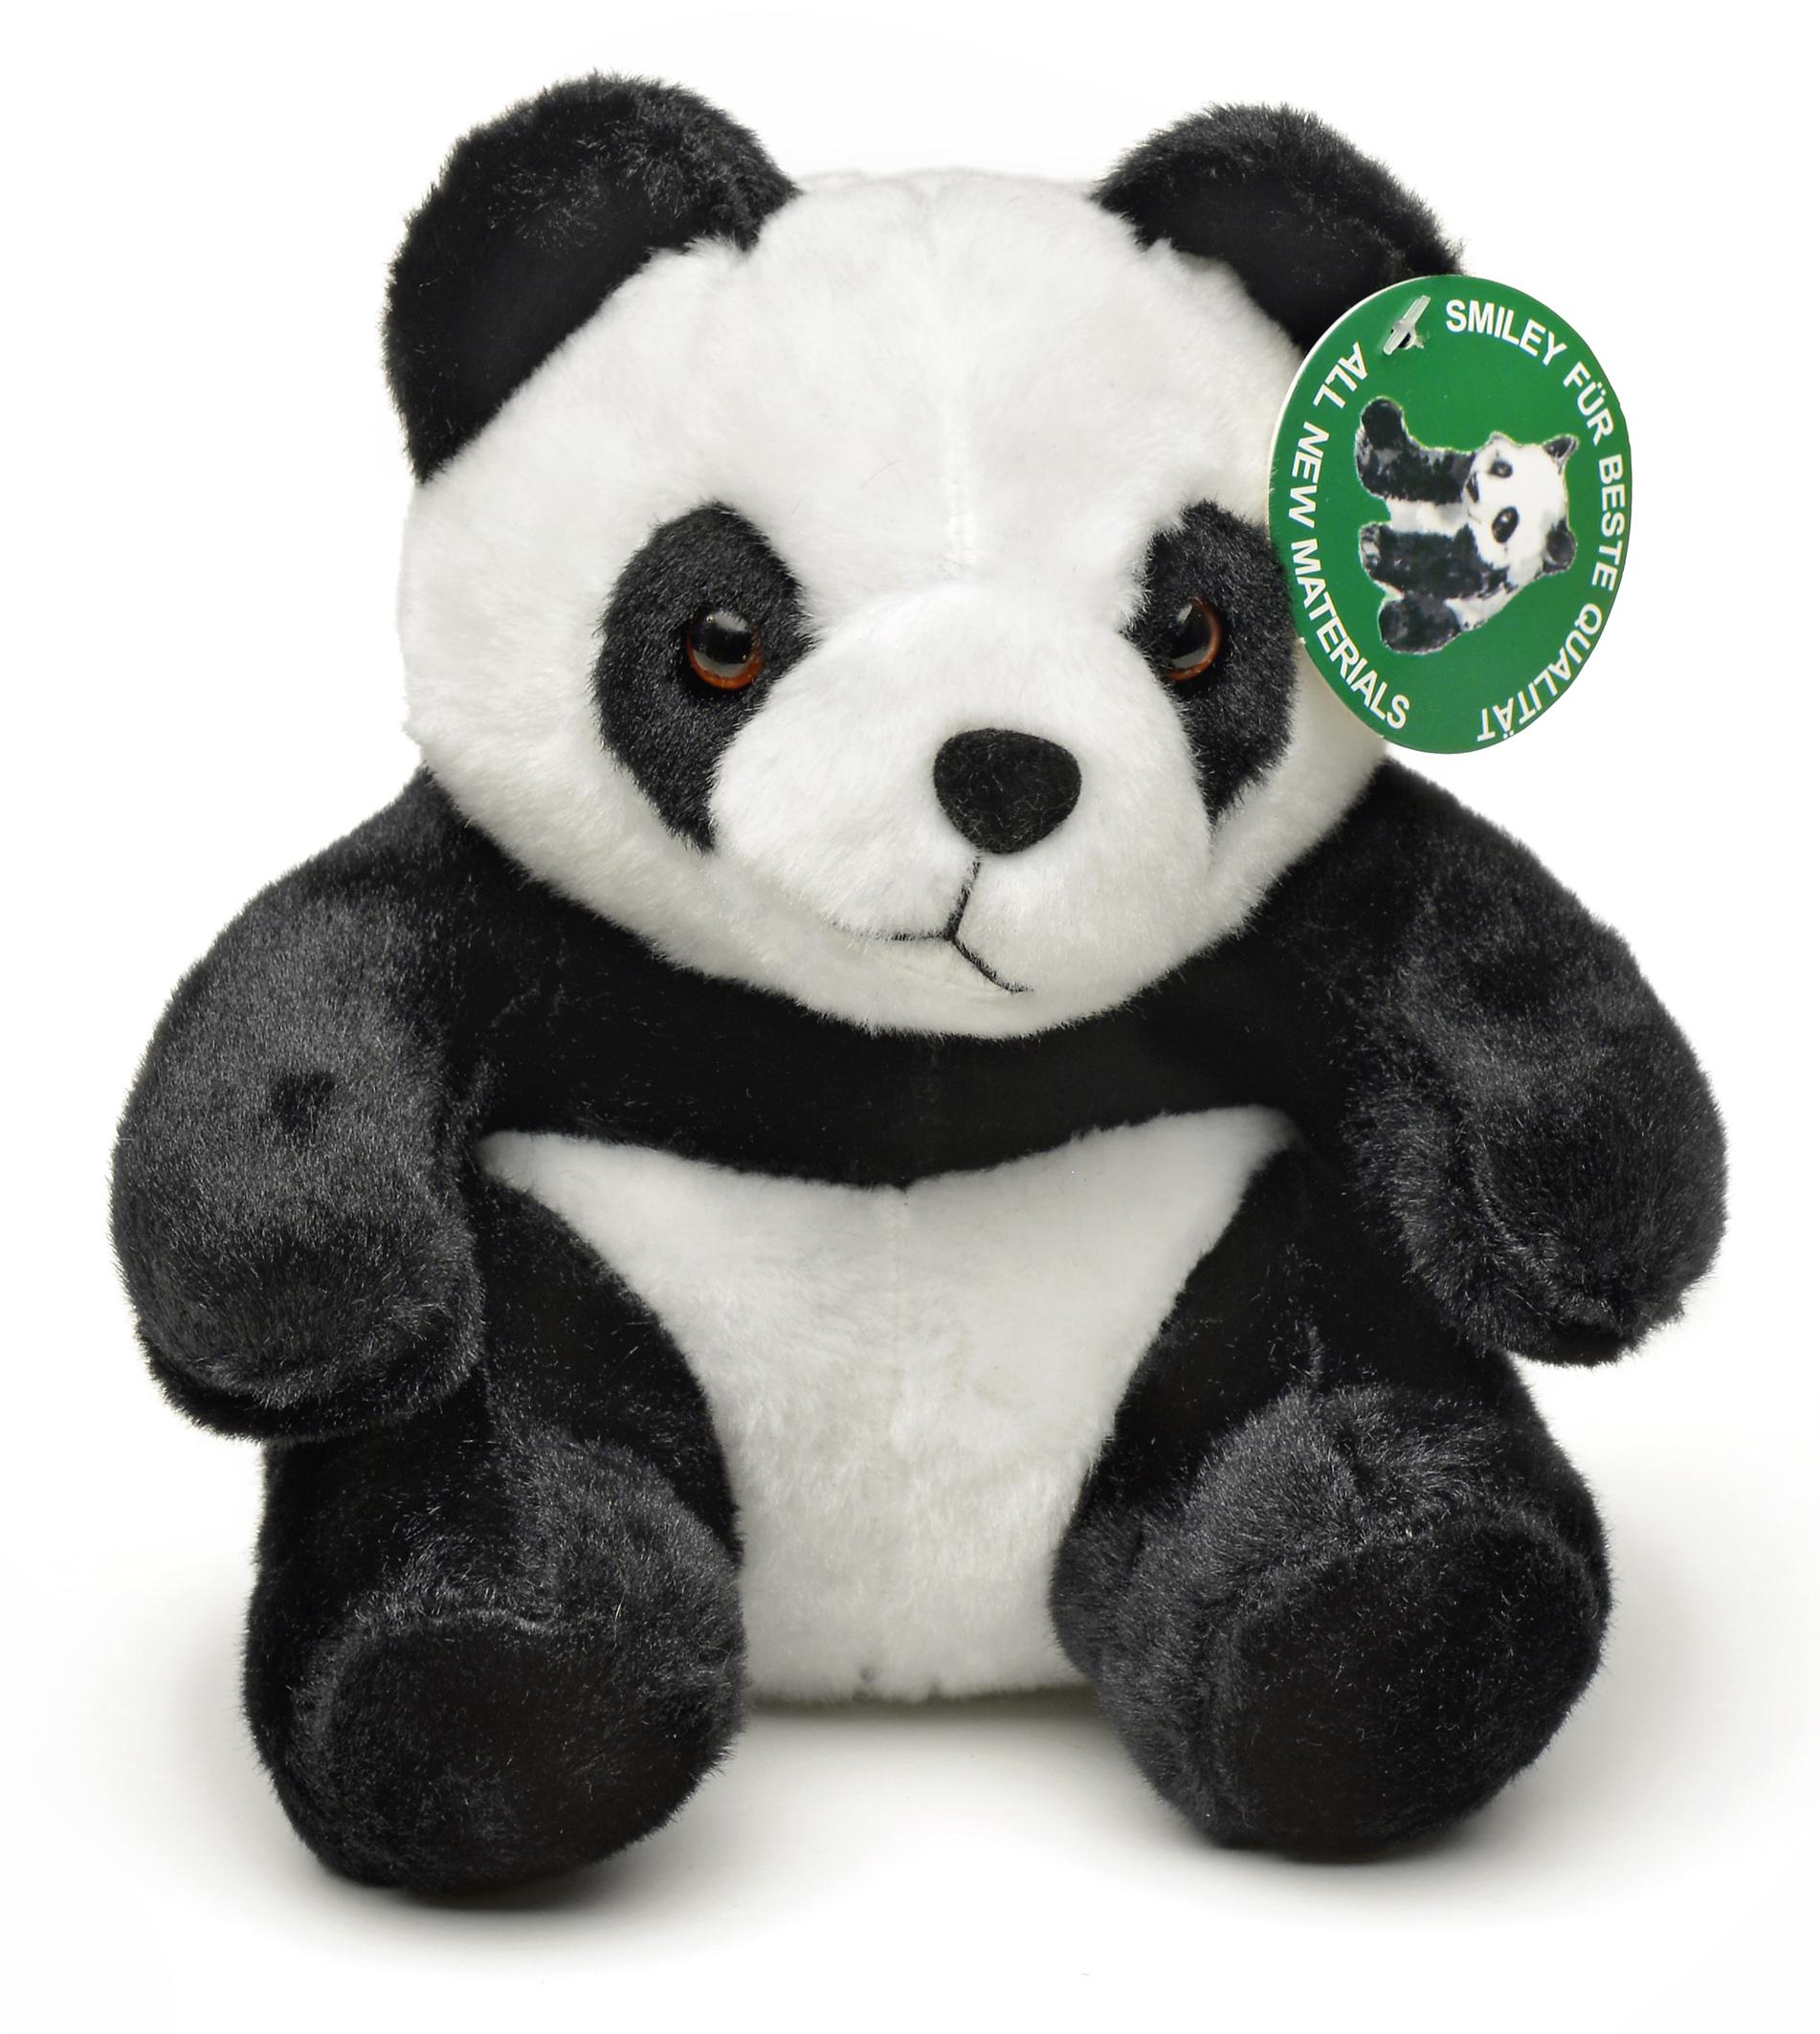 040-1020 Plüsch-Panda BERLIN